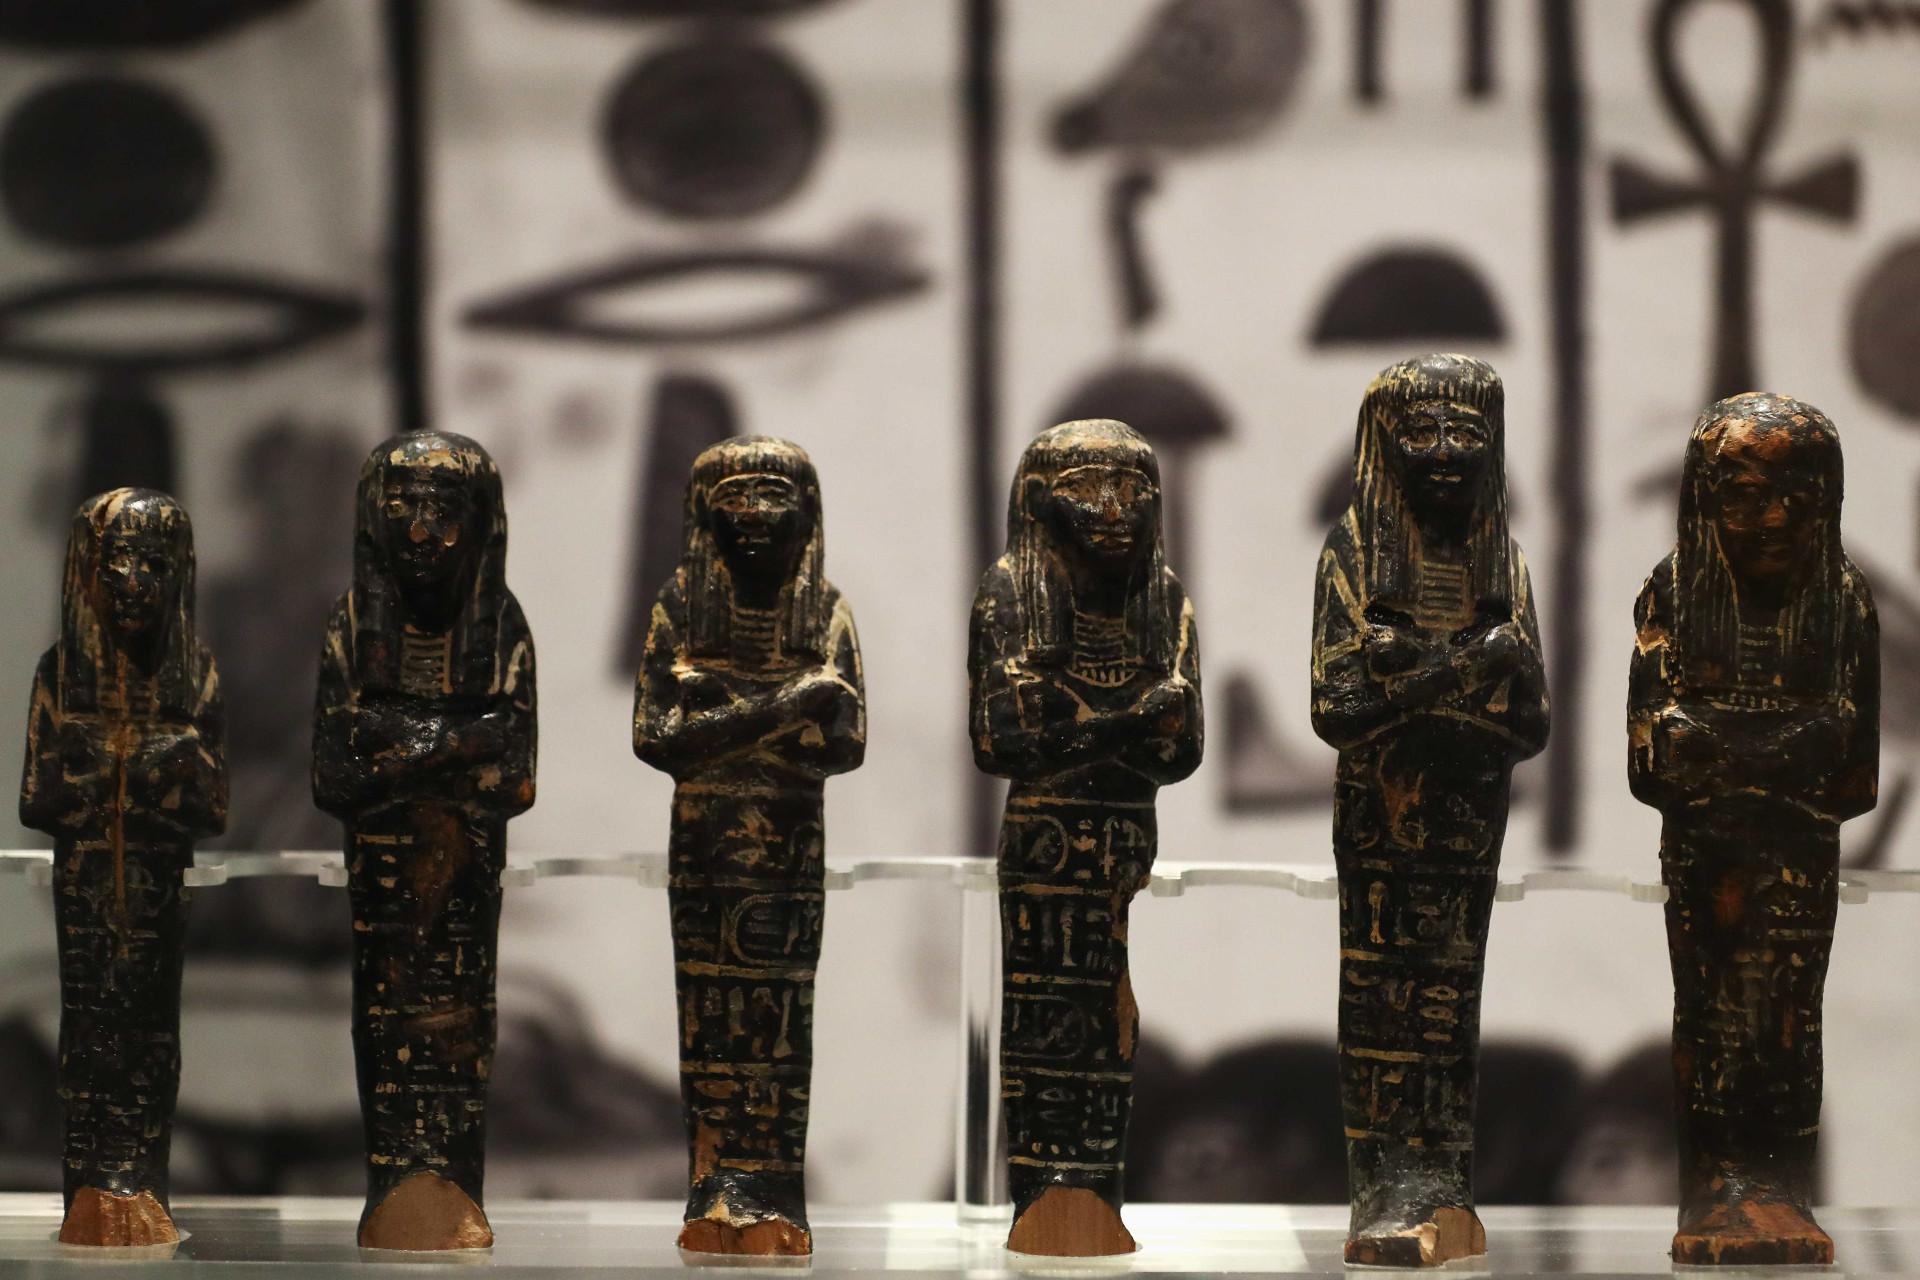 Tumba de Nefertari está aberta à visitação